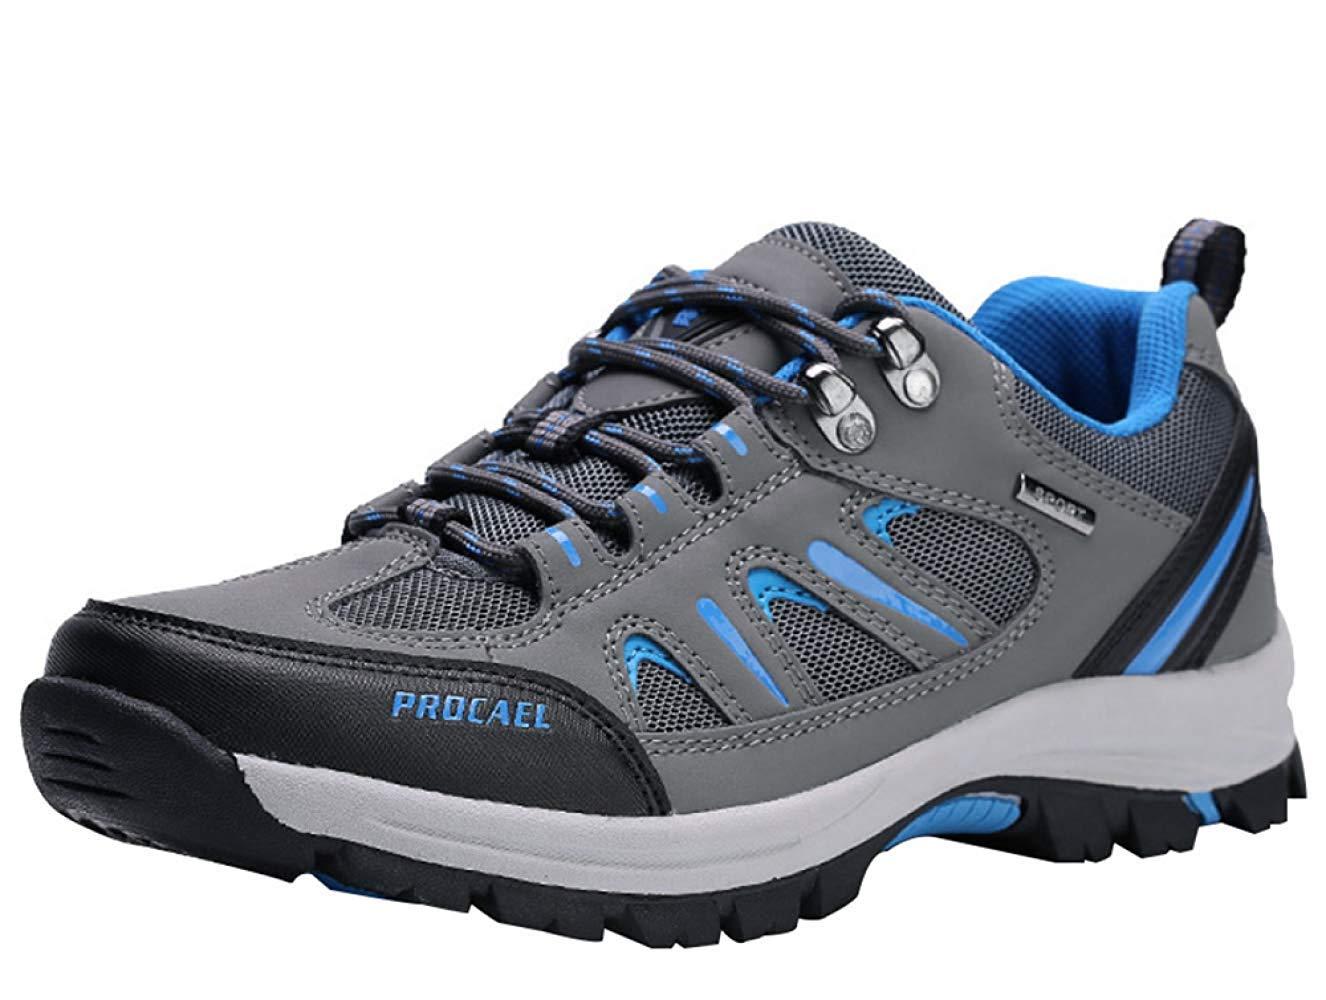 HhGold Männer Wanderschuhe Stiefel Leder Wanderschuhe Turnschuhe Für Outdoor Trekking Training Beiläufige Arbeit (Farbe : 2, Größe : 40EU)